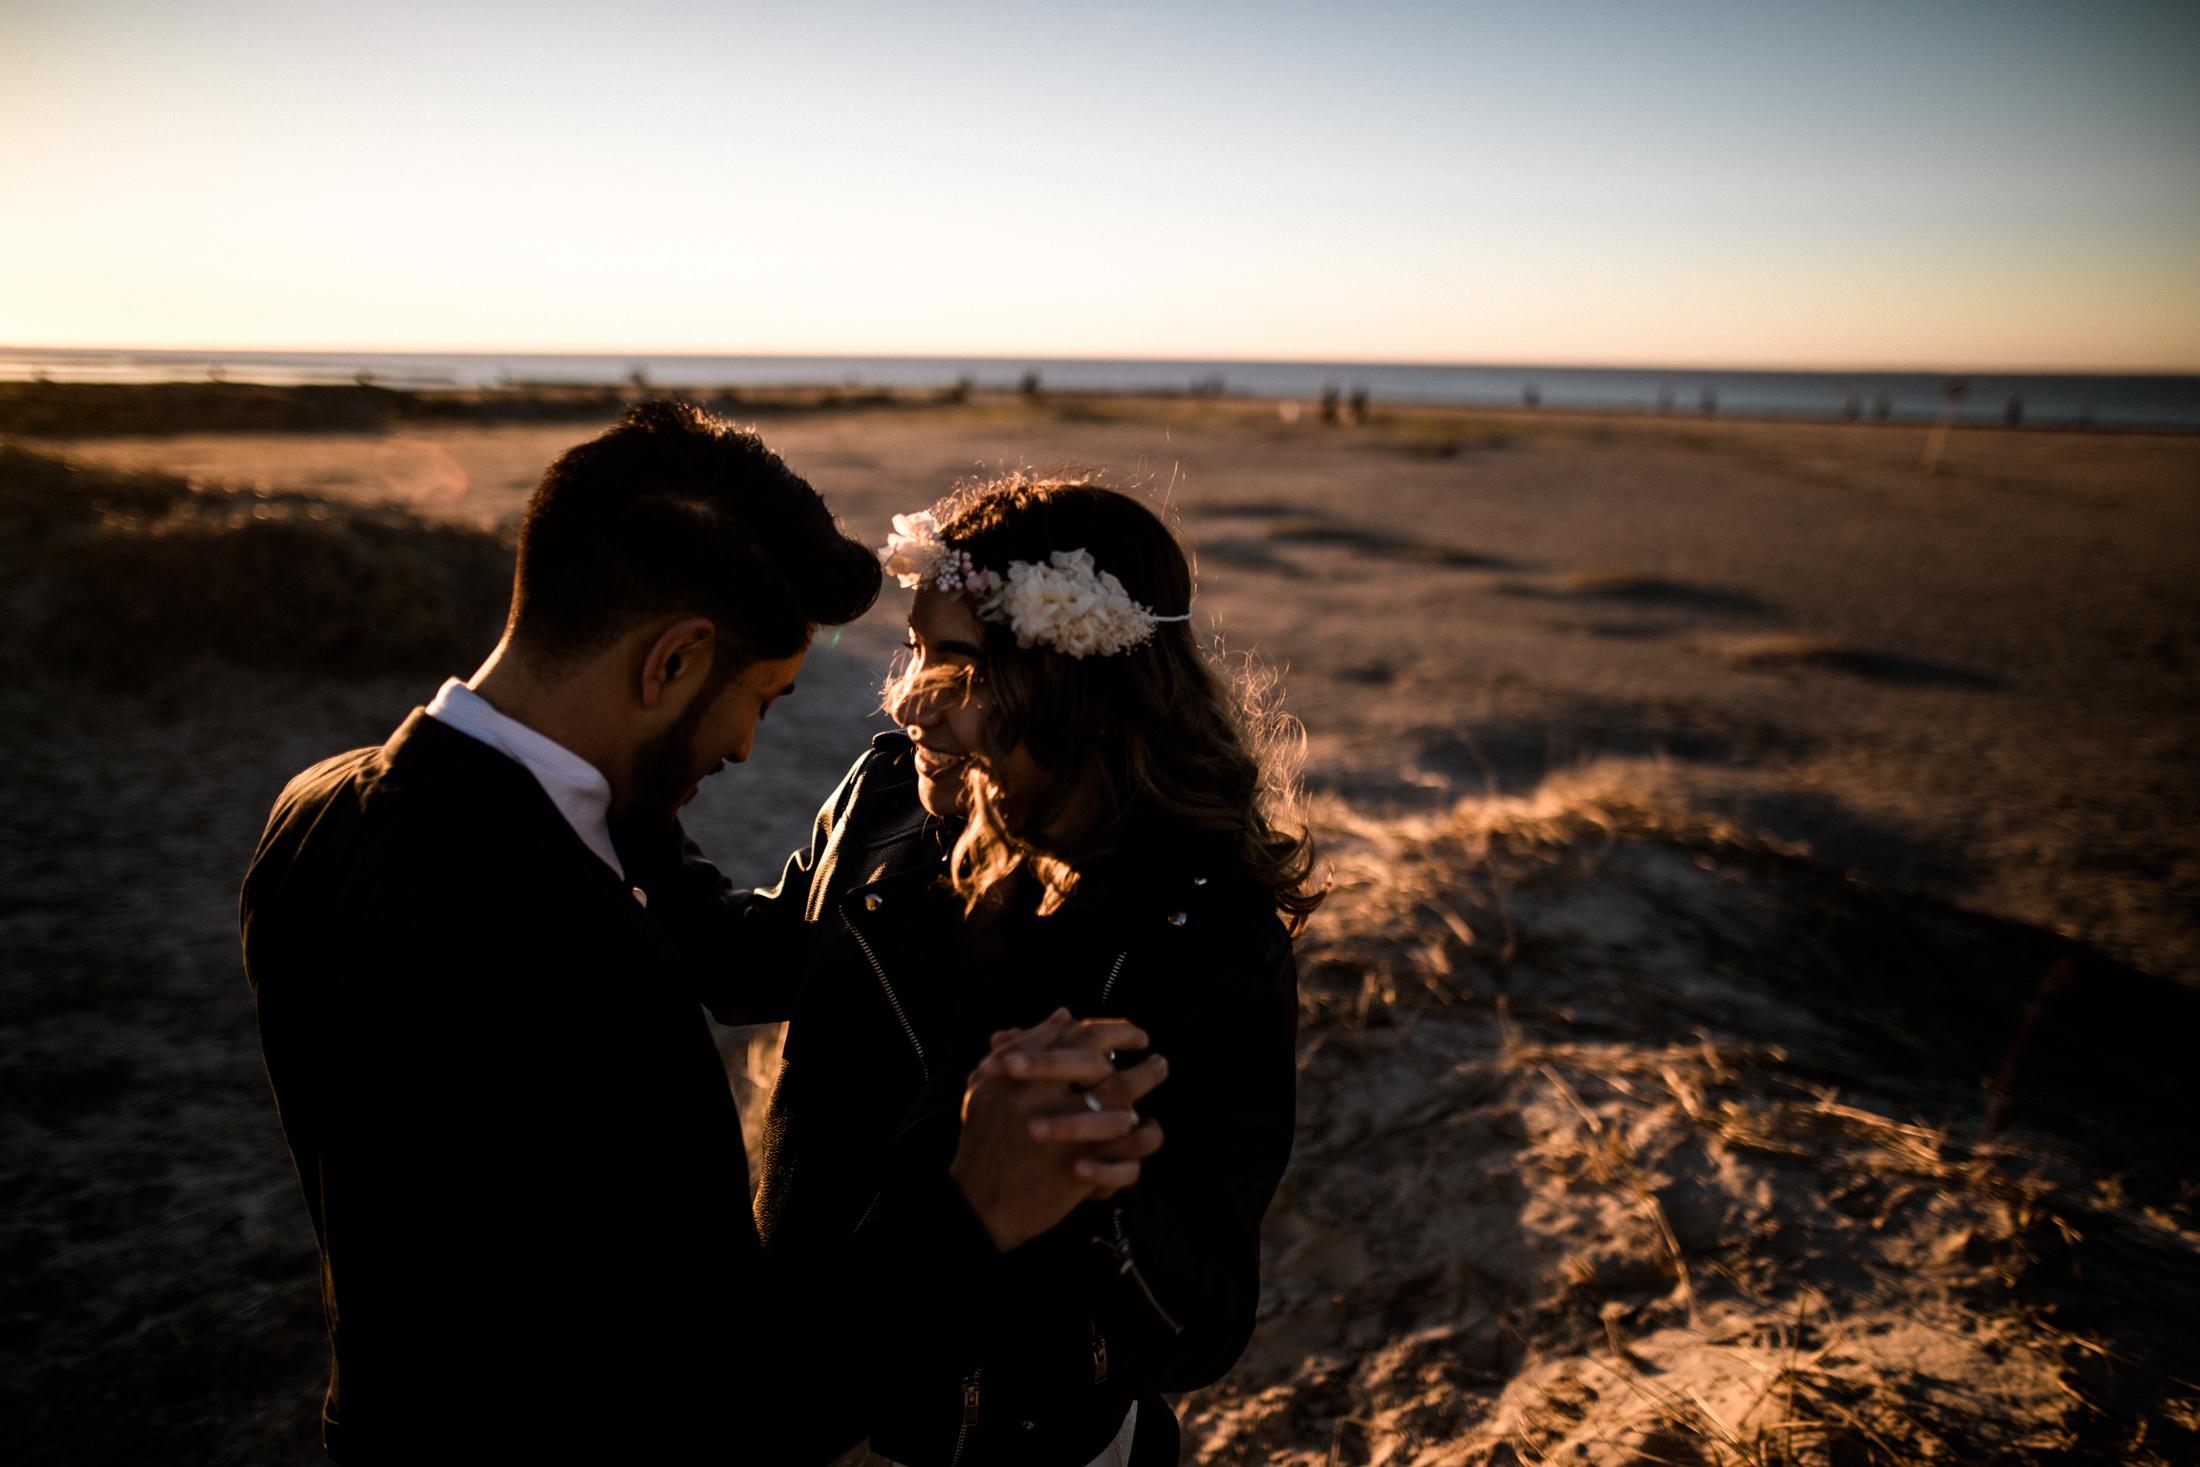 Wedding_Photographer_Mallorca_Daniela-Marquardt_Photography_CanaryIslands_Lanzarote_Iceland_Tuskany_Santorini_Portugal_Schweiz_Austria_Bayern_Elopement_Hochzeitsfotograf_Norddeichich_24